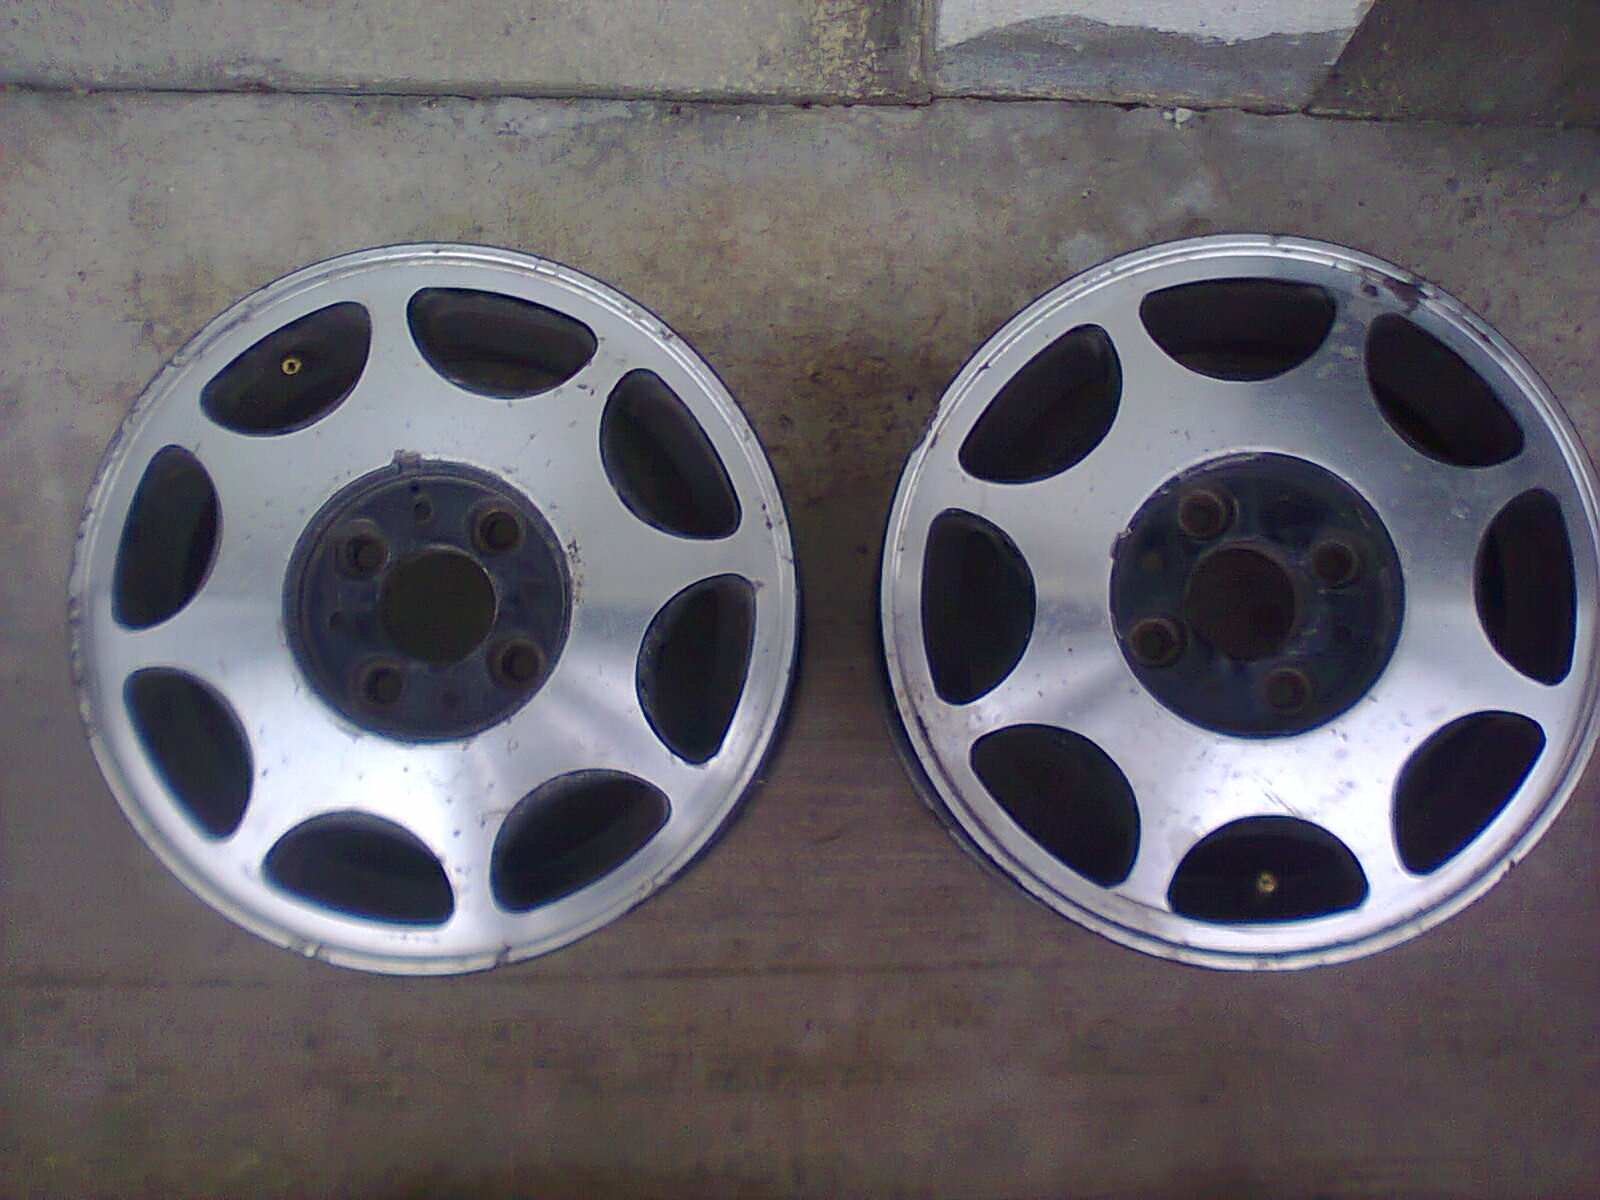 Stock alloy wheels Alu-felne-za-yuga-koralke-13_slika_O_8267017